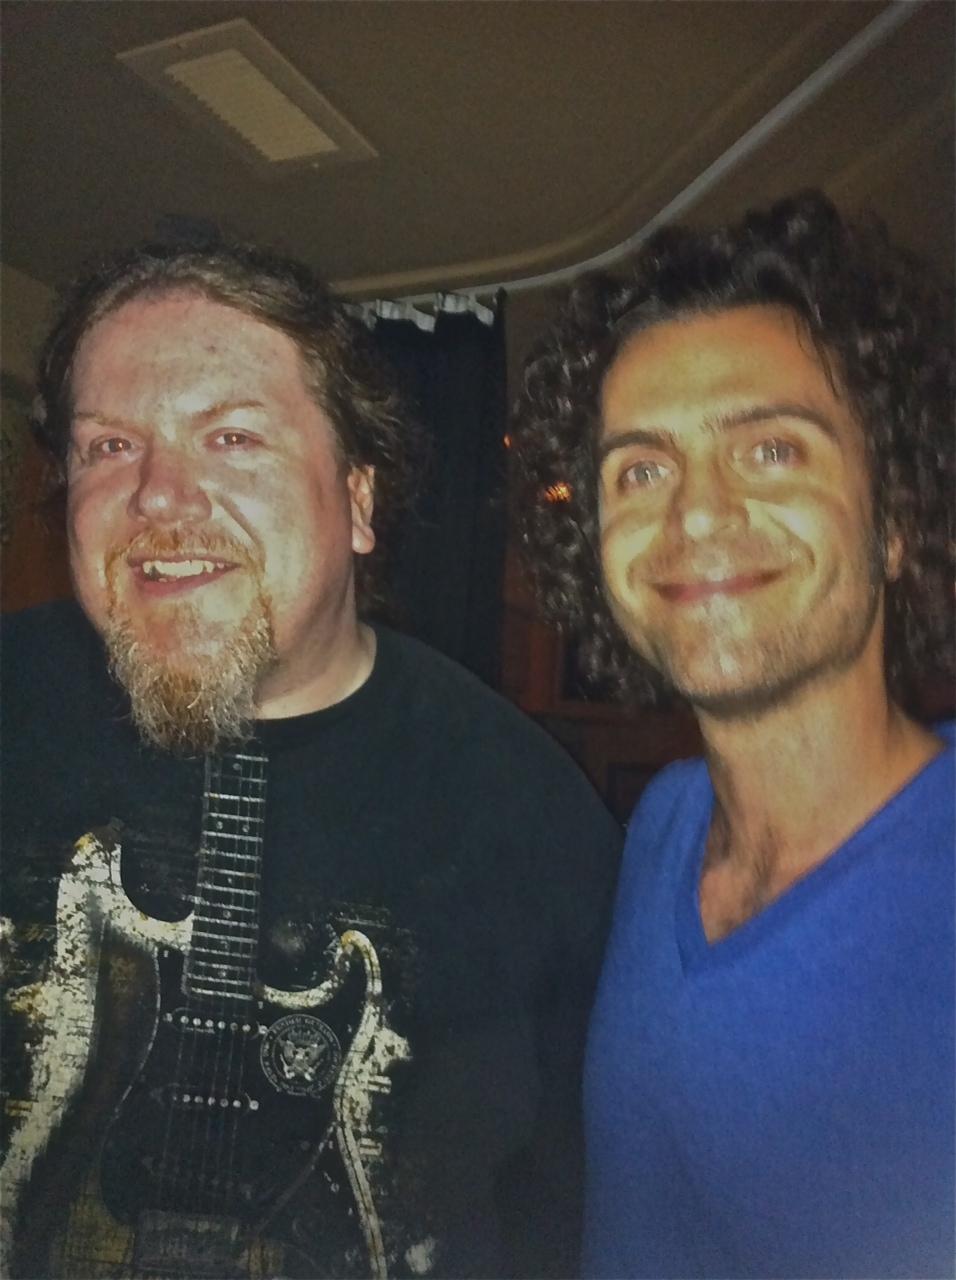 Ben and Dweezil Zappa